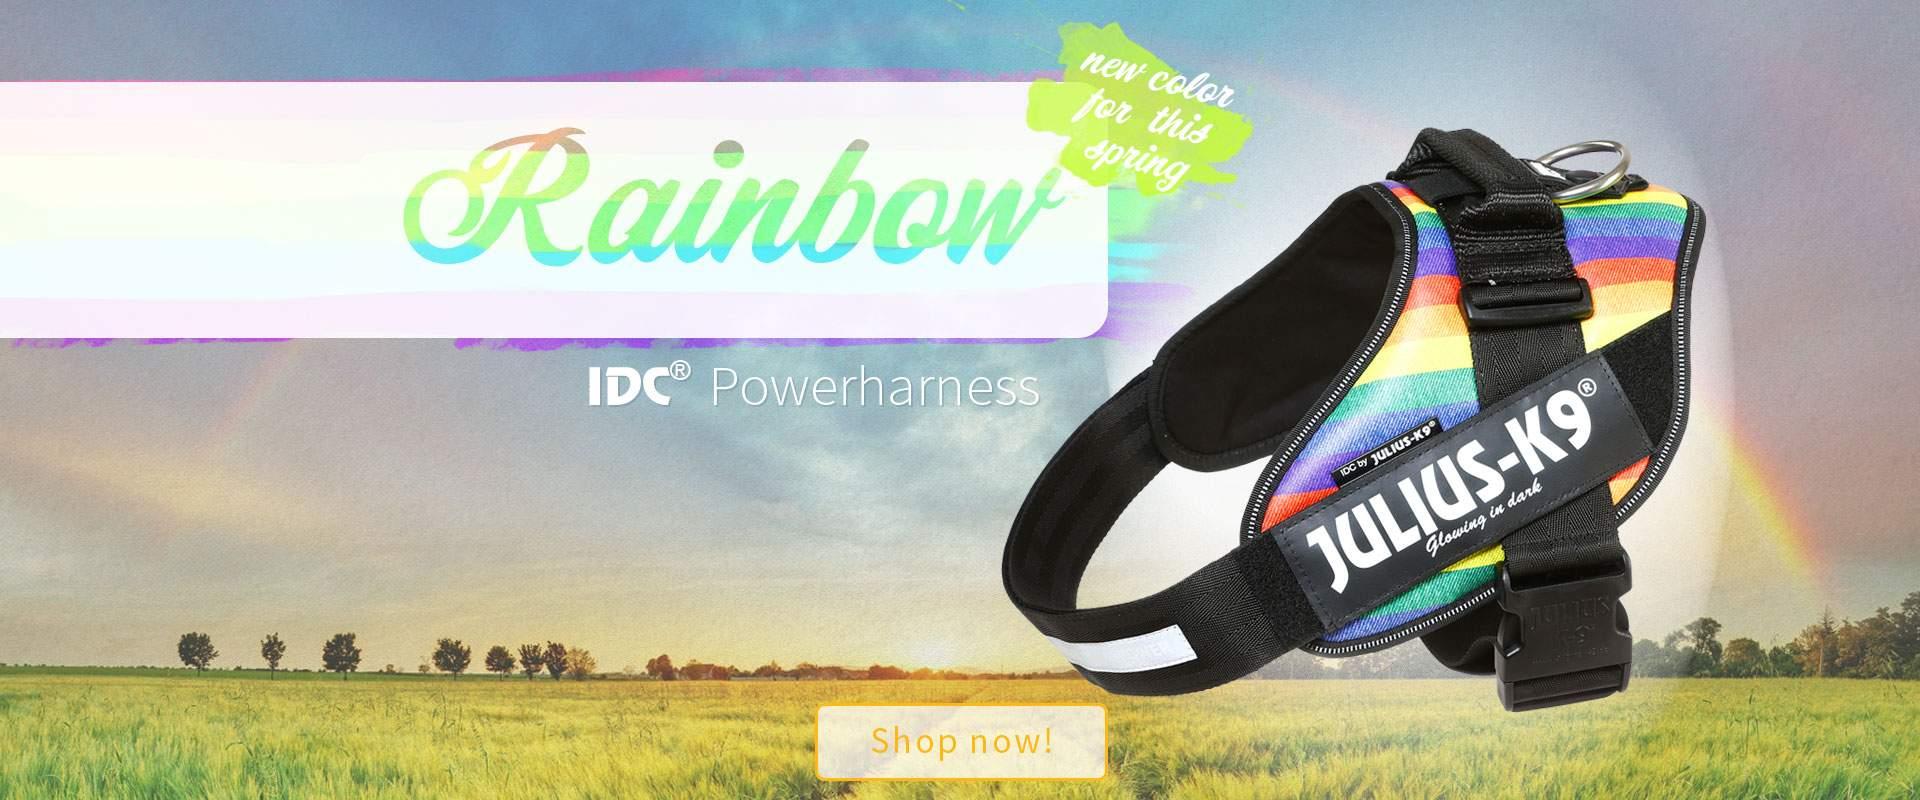 IDC new colors